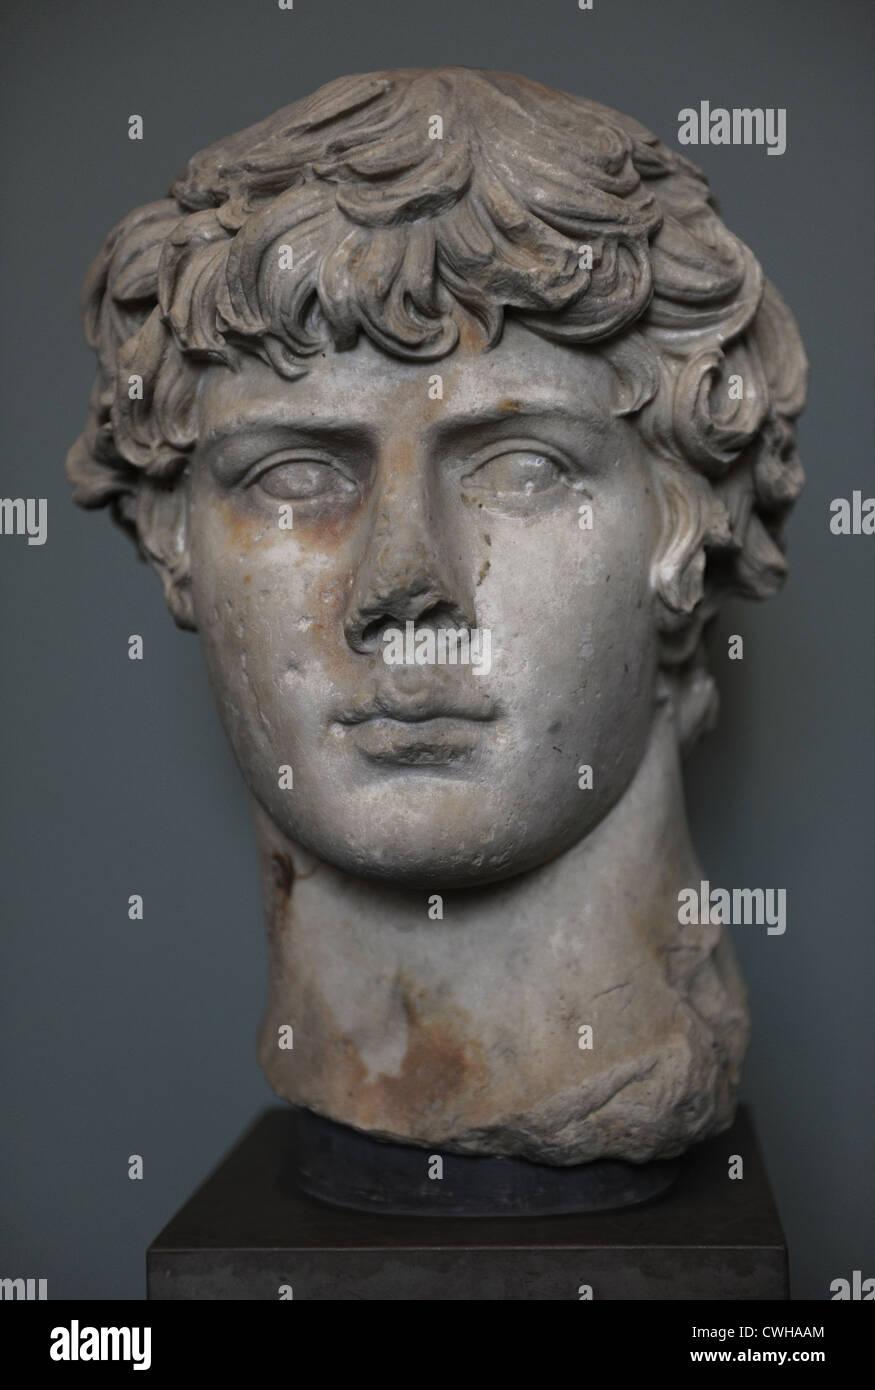 Antinous (110-130). Member of the Roman Emperor Hadrian's entourage. Bust. Marble. Dated c. 130. Carlsberg Glyptotek - Stock Image